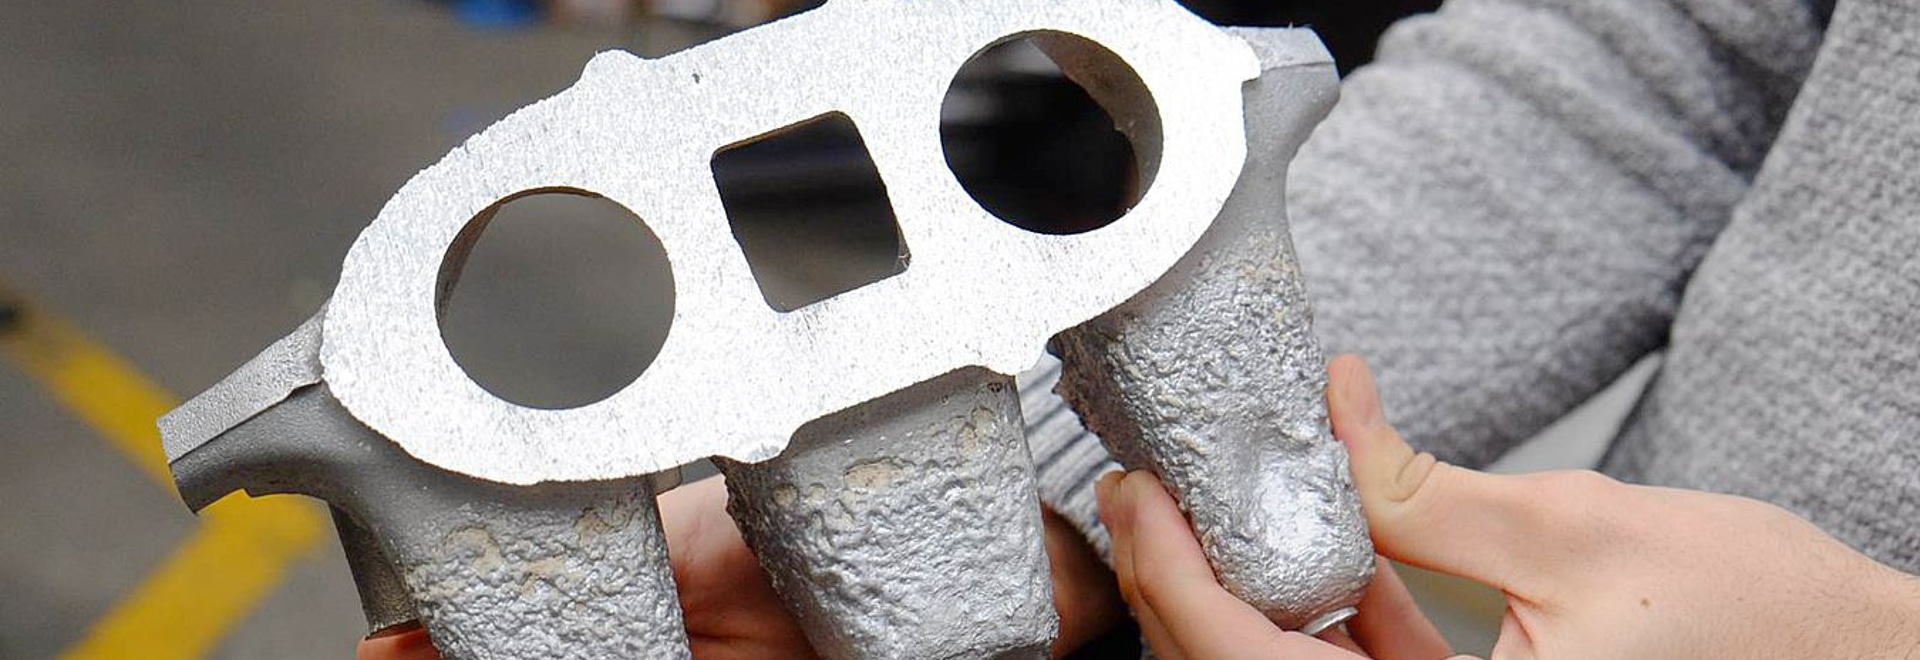 Bonetti is the choice of OMR Automotive for improve San Felice foundry.